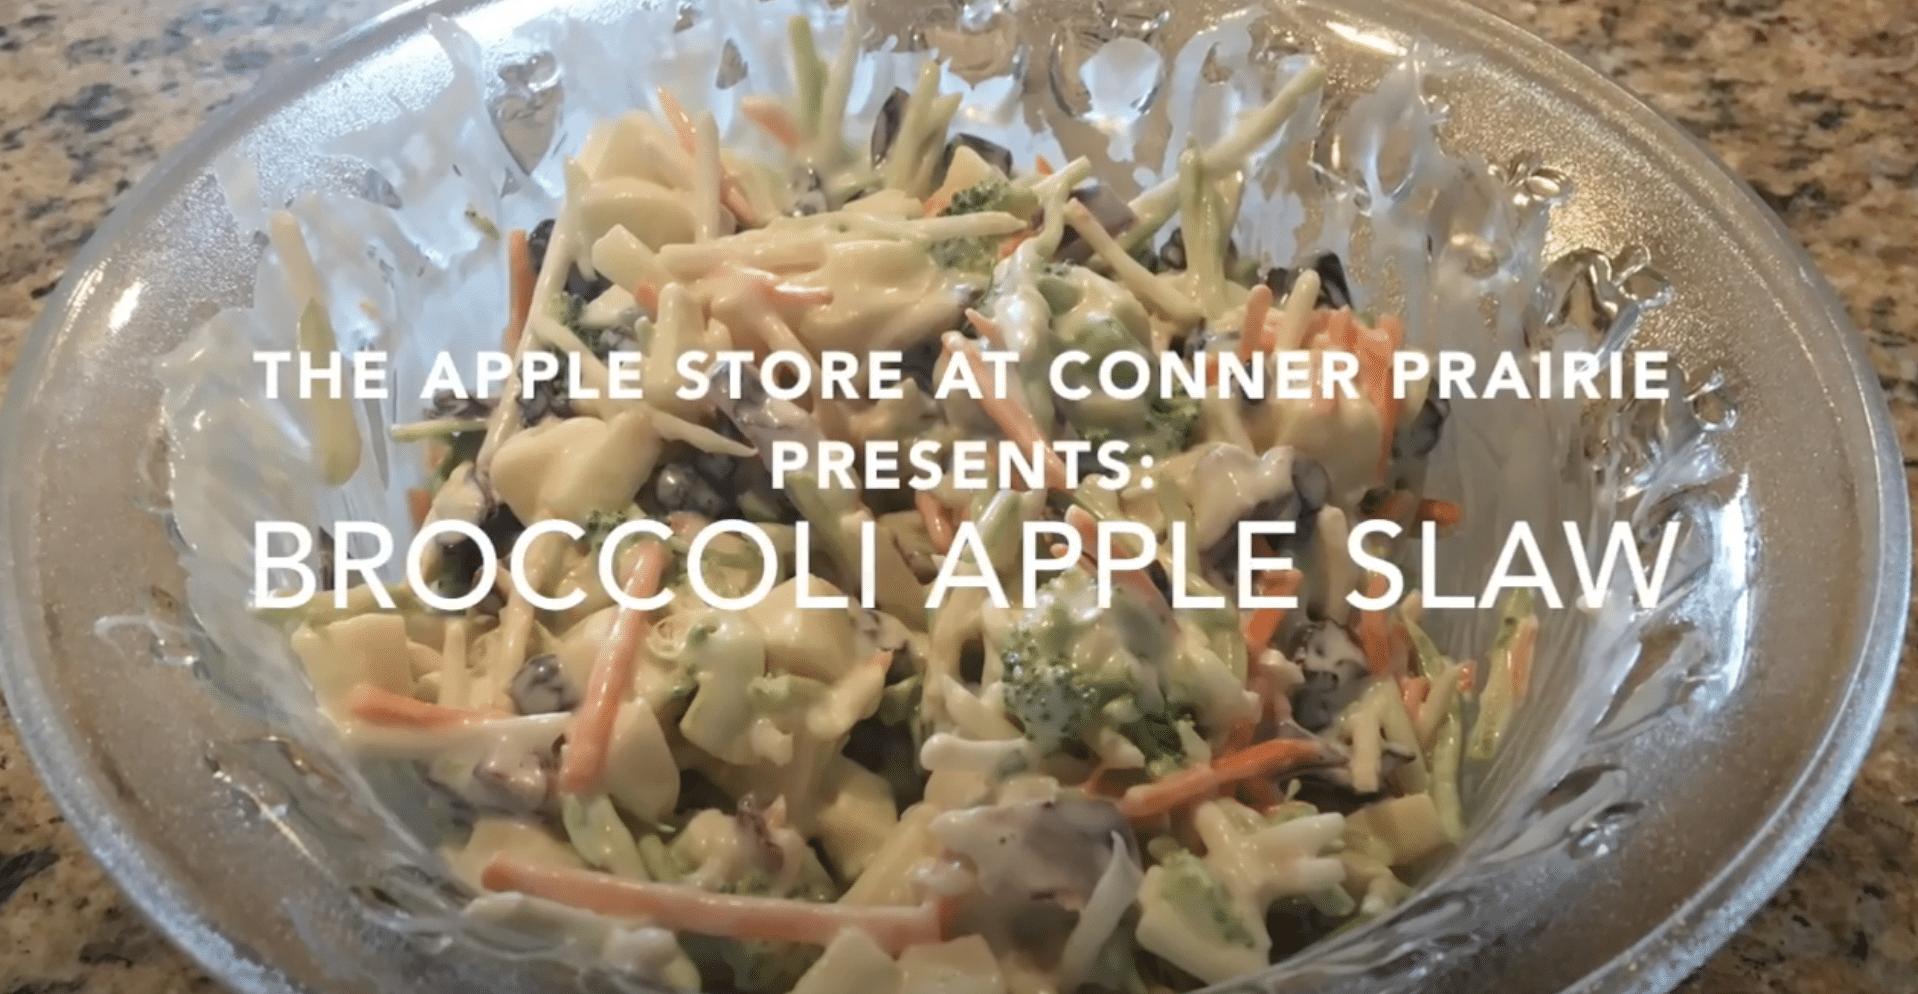 Broccoli Apple Slaw